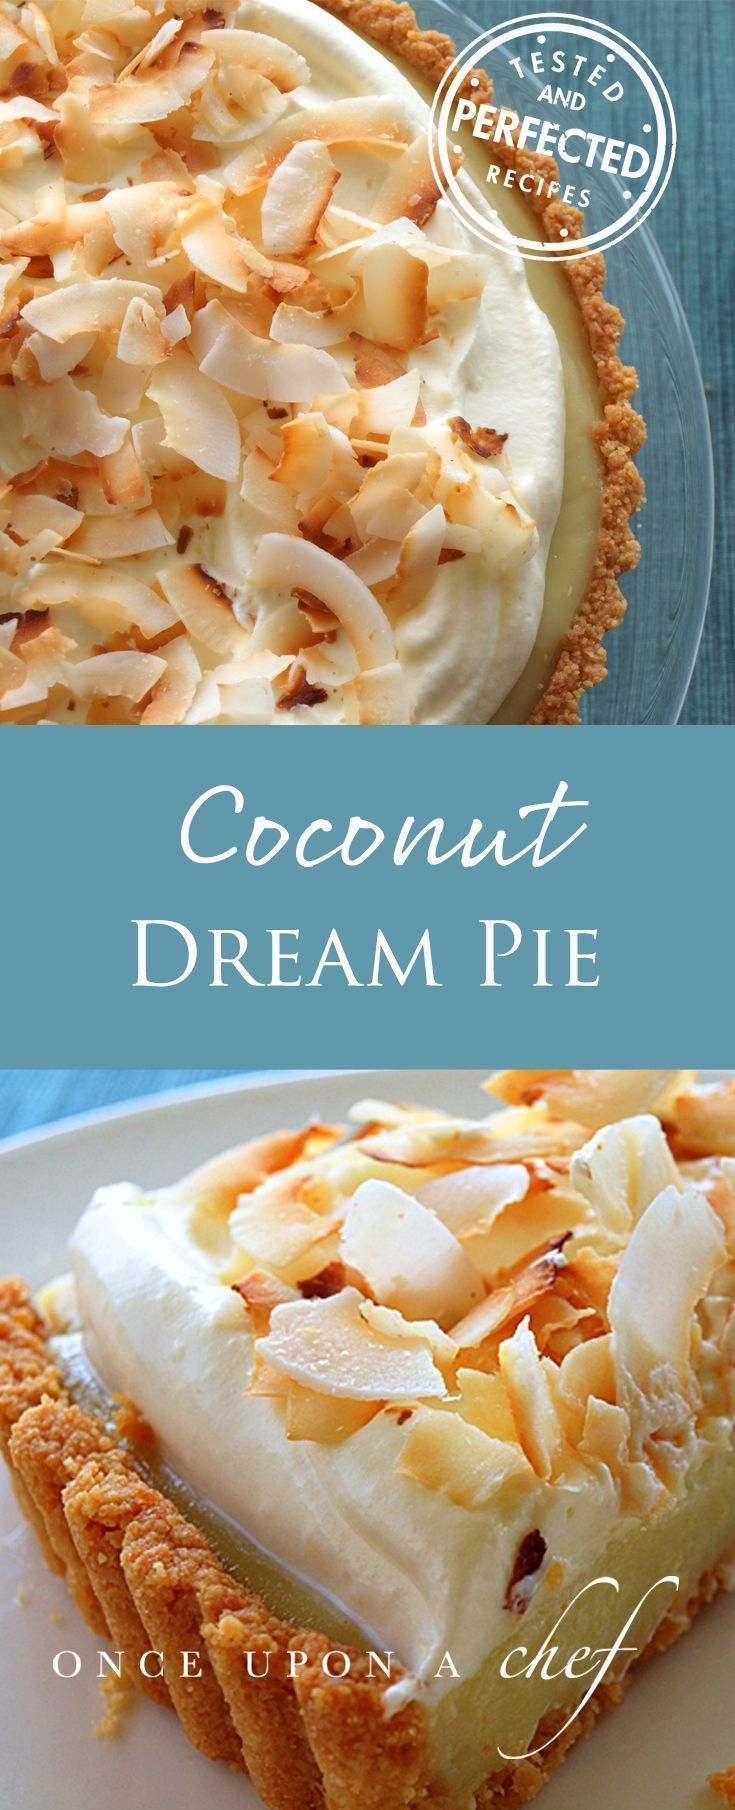 Accidental Cream Pie Cool best 25+ drink specials ideas on pinterest | yummy healthy snacks